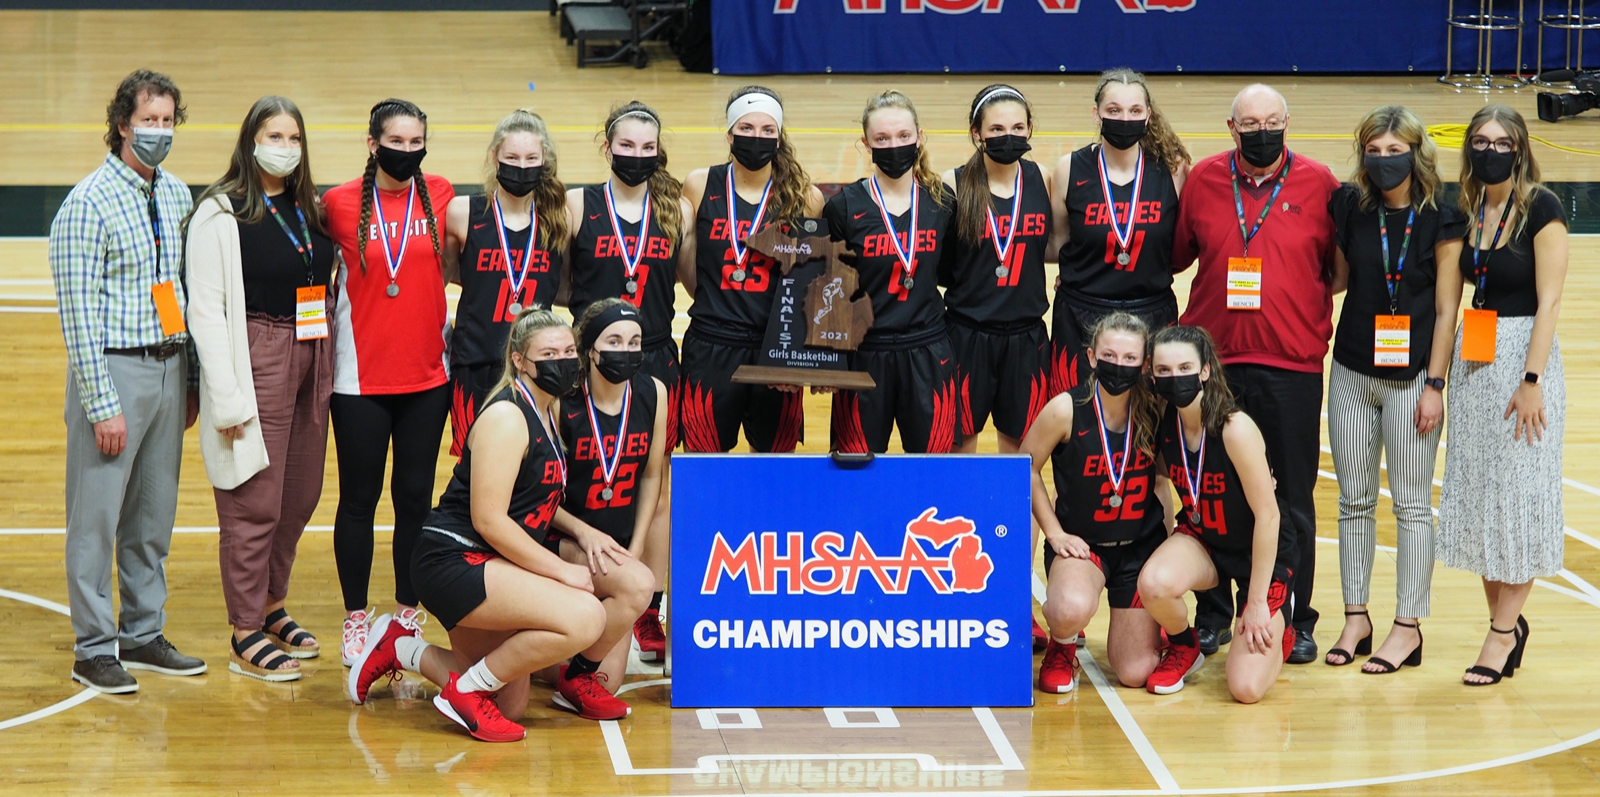 Varsity girls fall, 52-50, to Grass Lake in state championship game